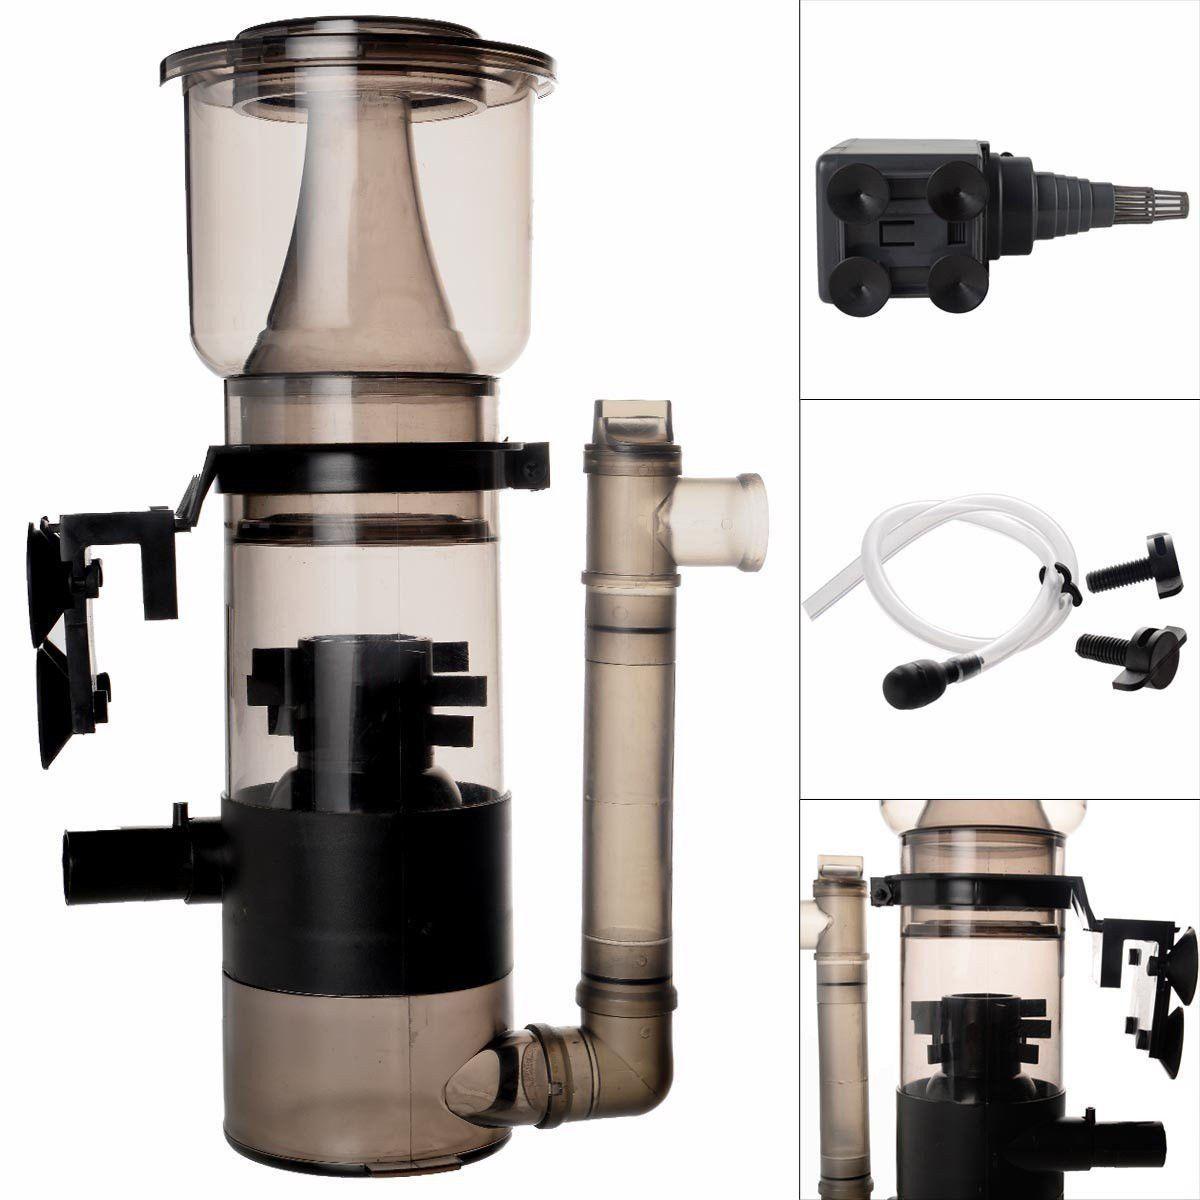 Fish tank supplies - Aquarium Protein Skimmer 150 Gal W Pump Filter Salt Water Powerhead Tank Go Shop Pet Supplies